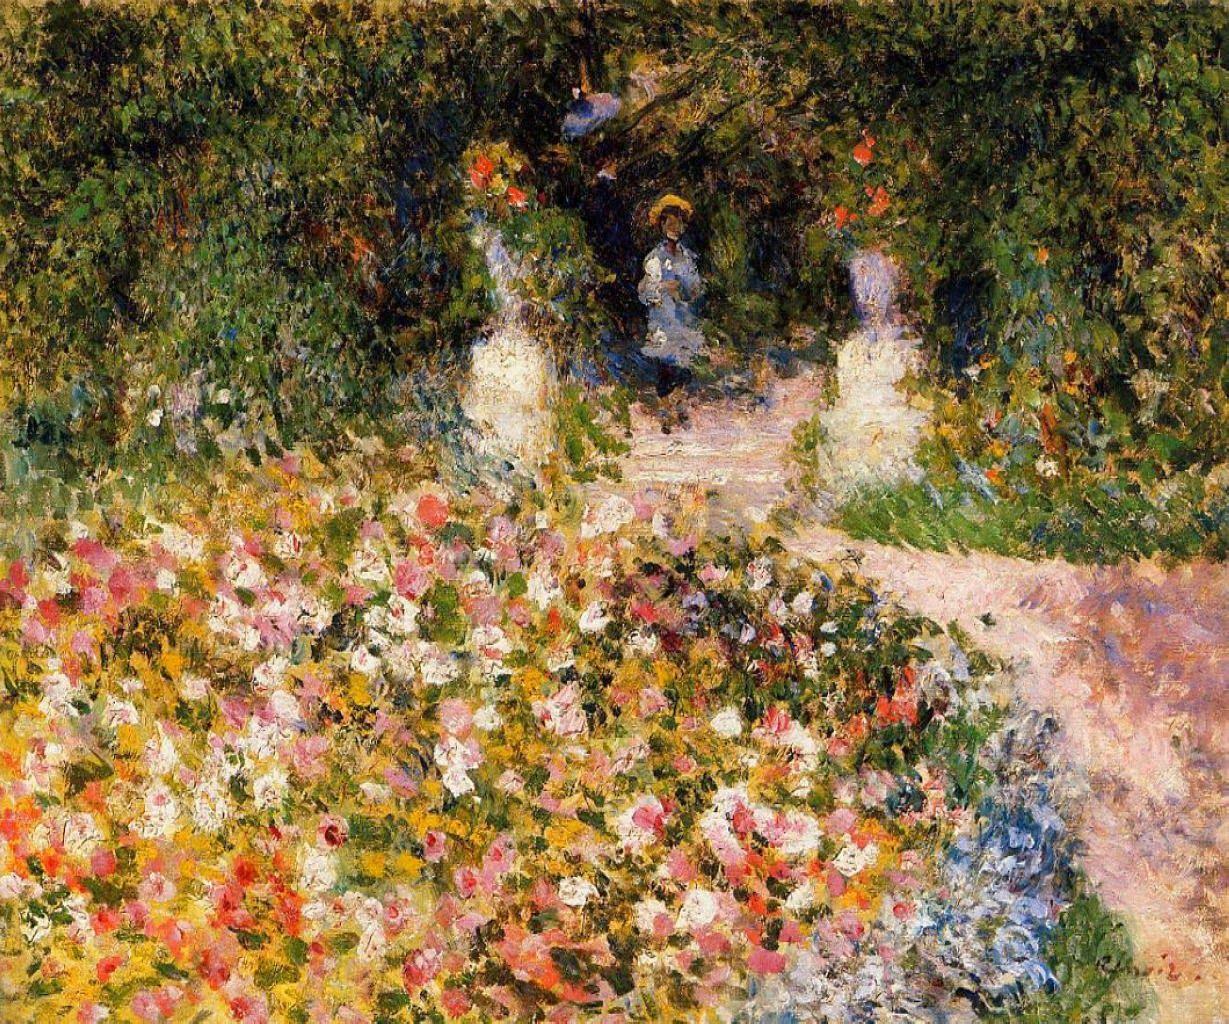 Garden Paintings Pierre Auguste Renoir Gartenmalerei Impressionismus Impressionistische Kunst